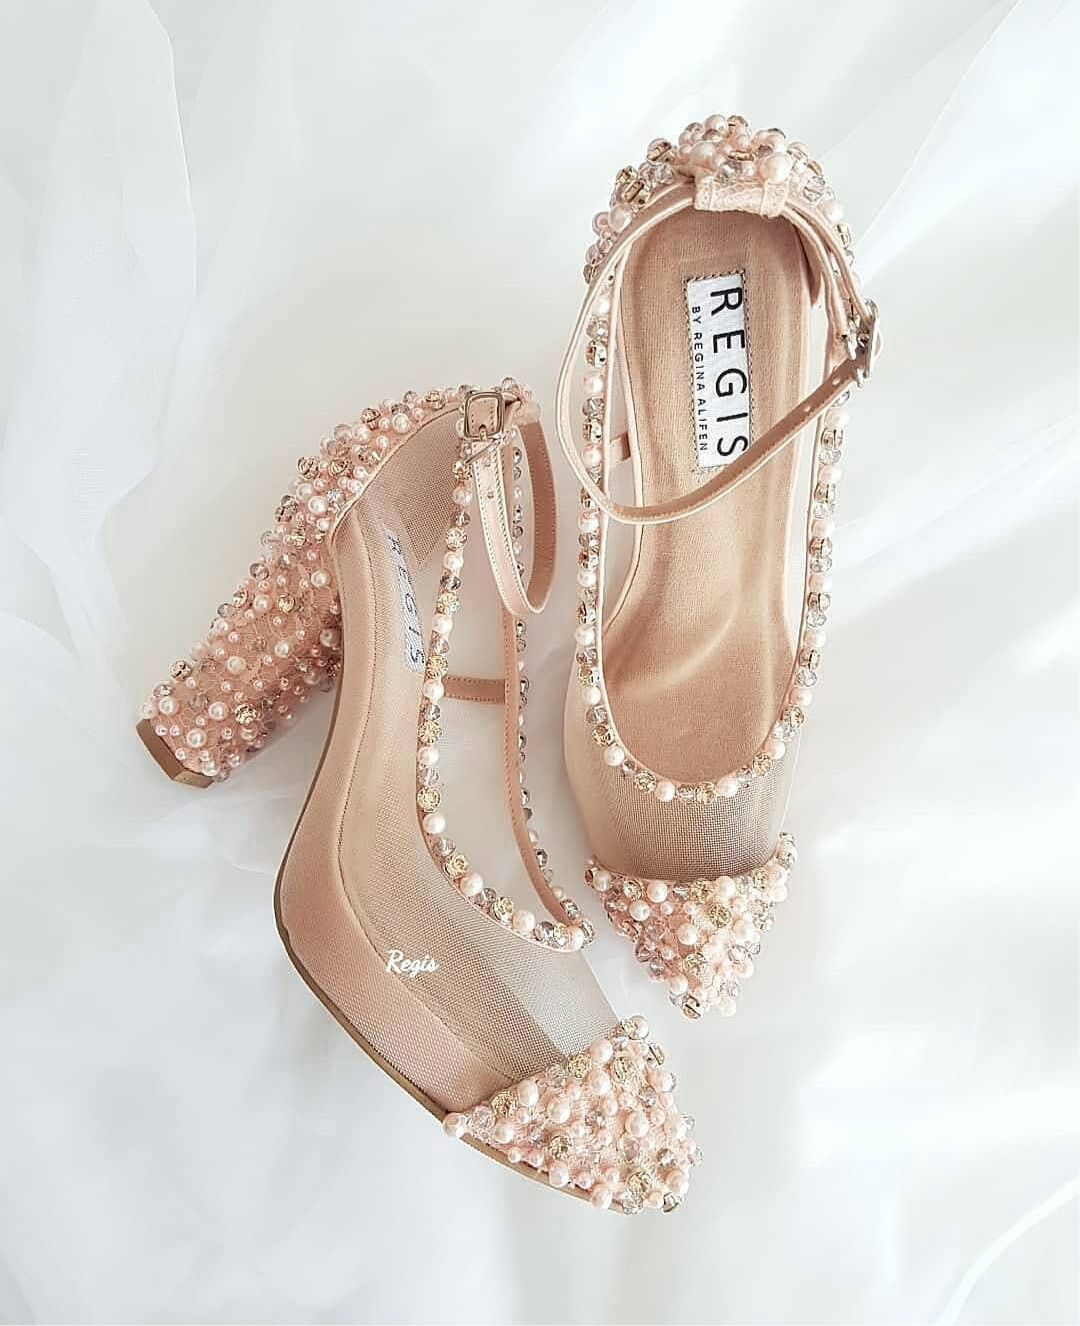 d047e2a1b Sapato de noiva: dicas do que toda noiva precisa saber!